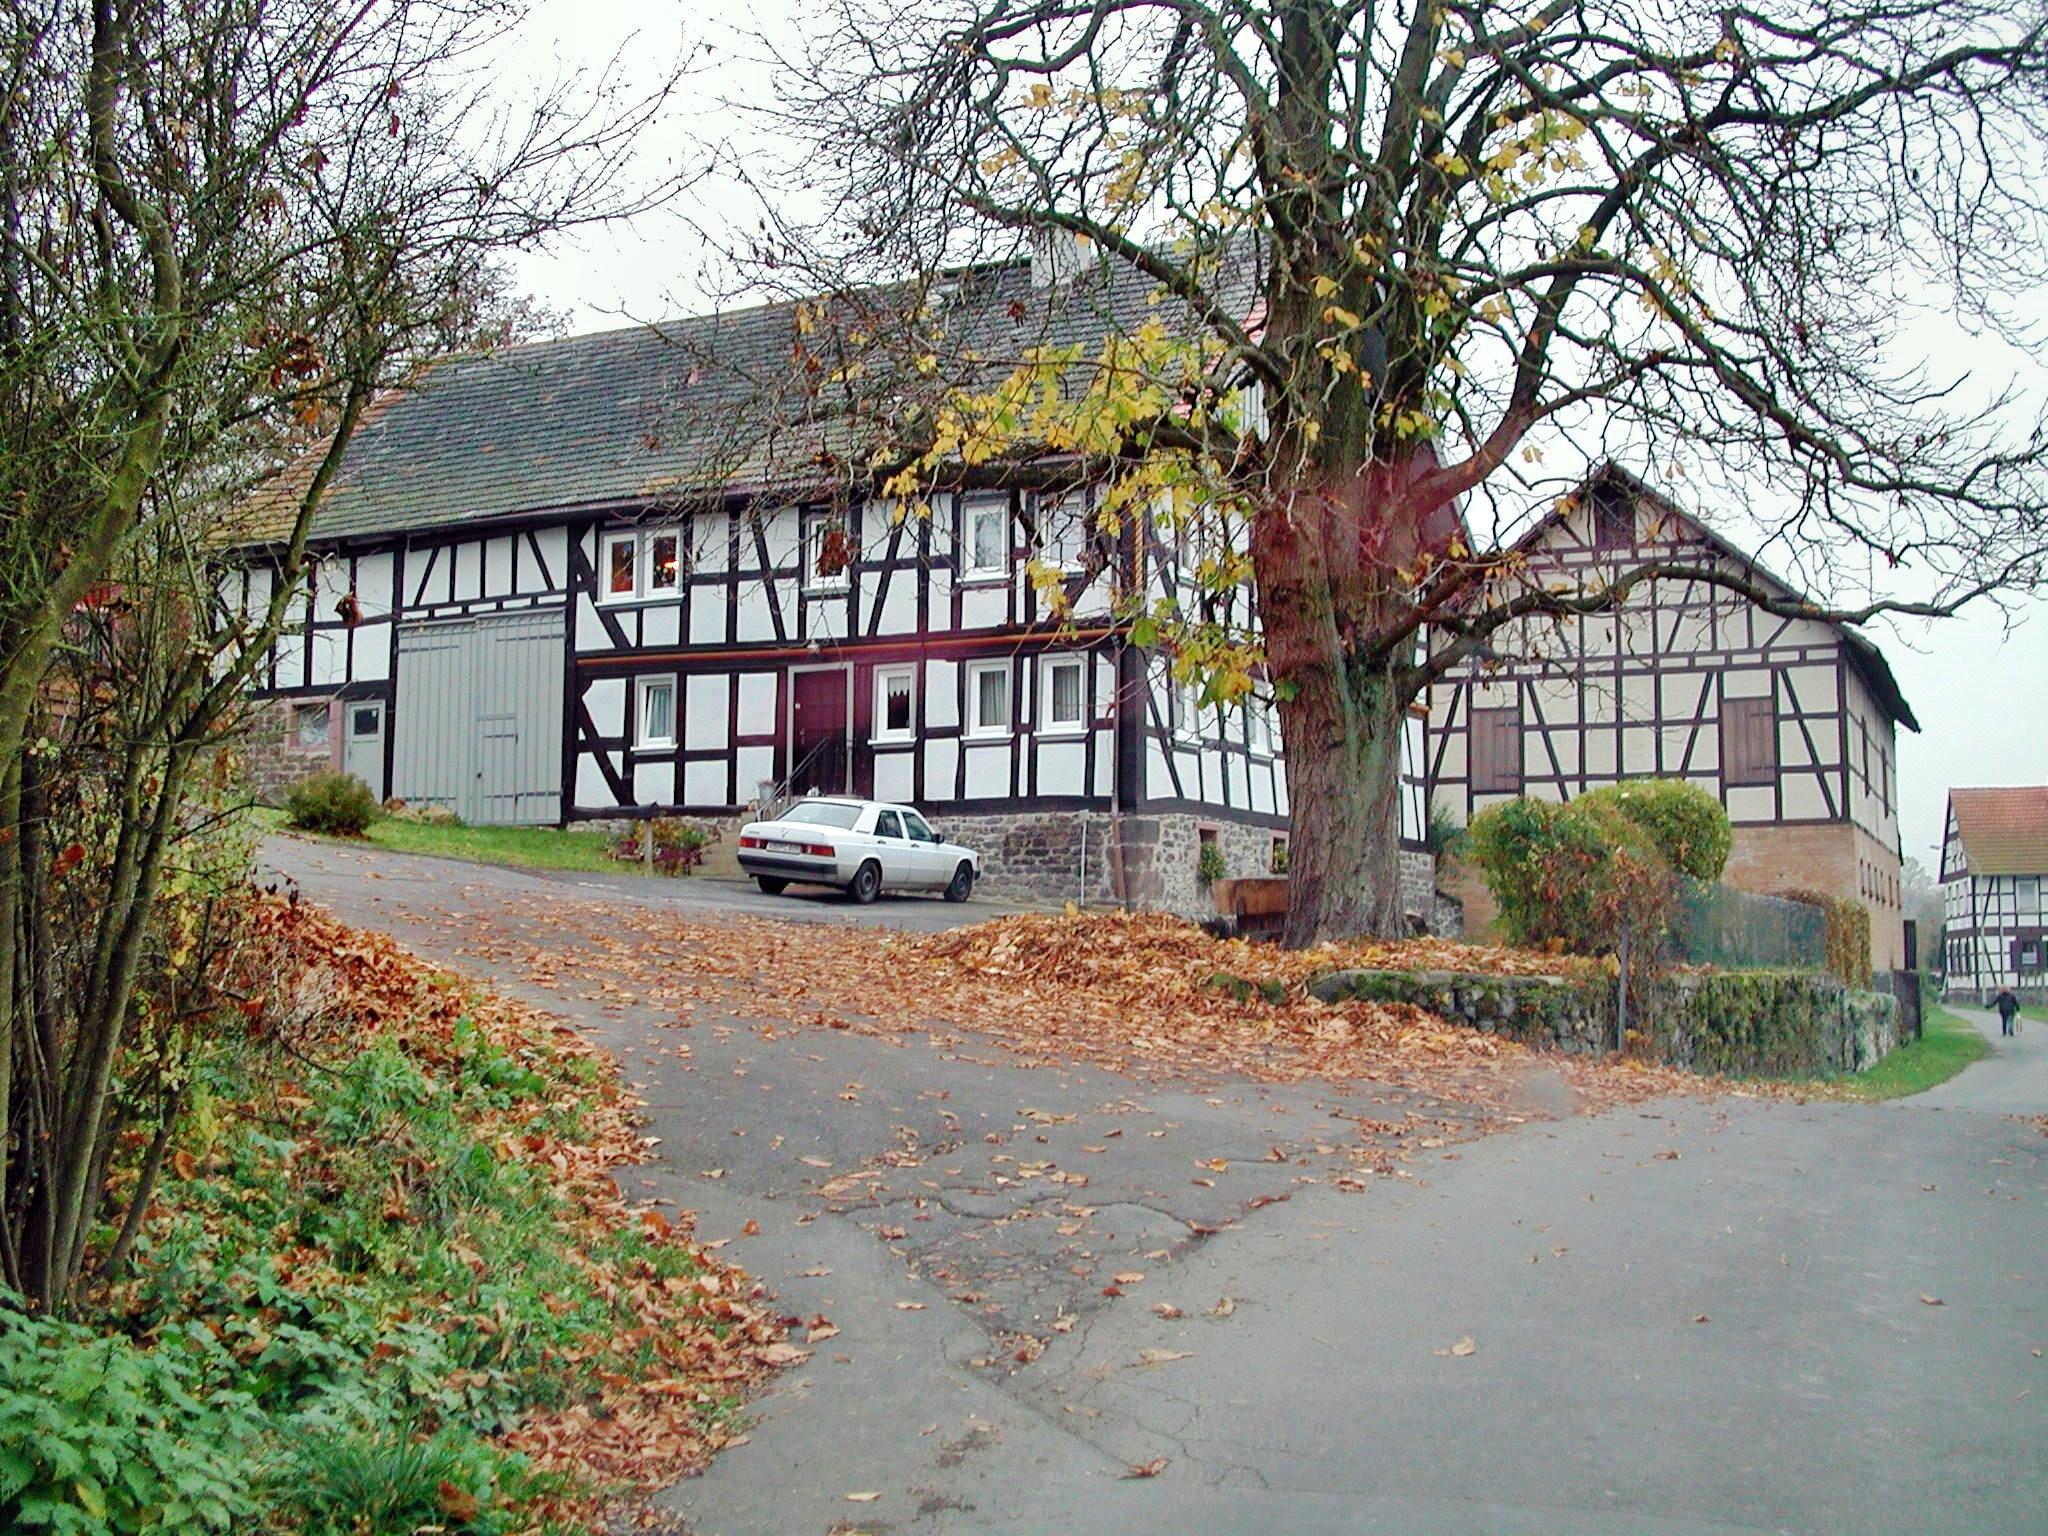 Schellnhausen-8.jpeg